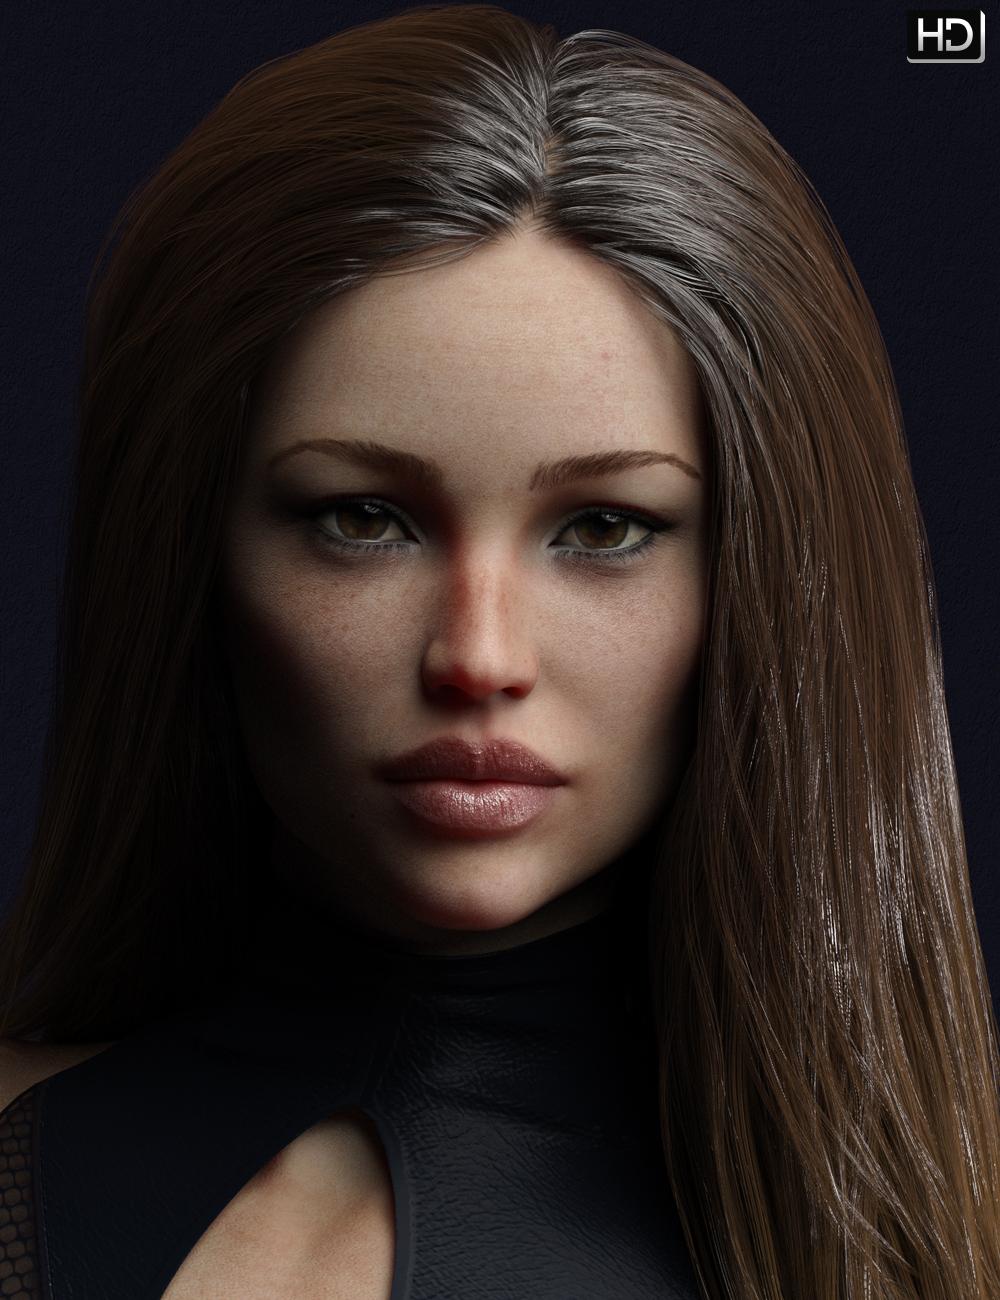 Caitlyn HD for Eva 8 by: EmrysFred Winkler Art, 3D Models by Daz 3D